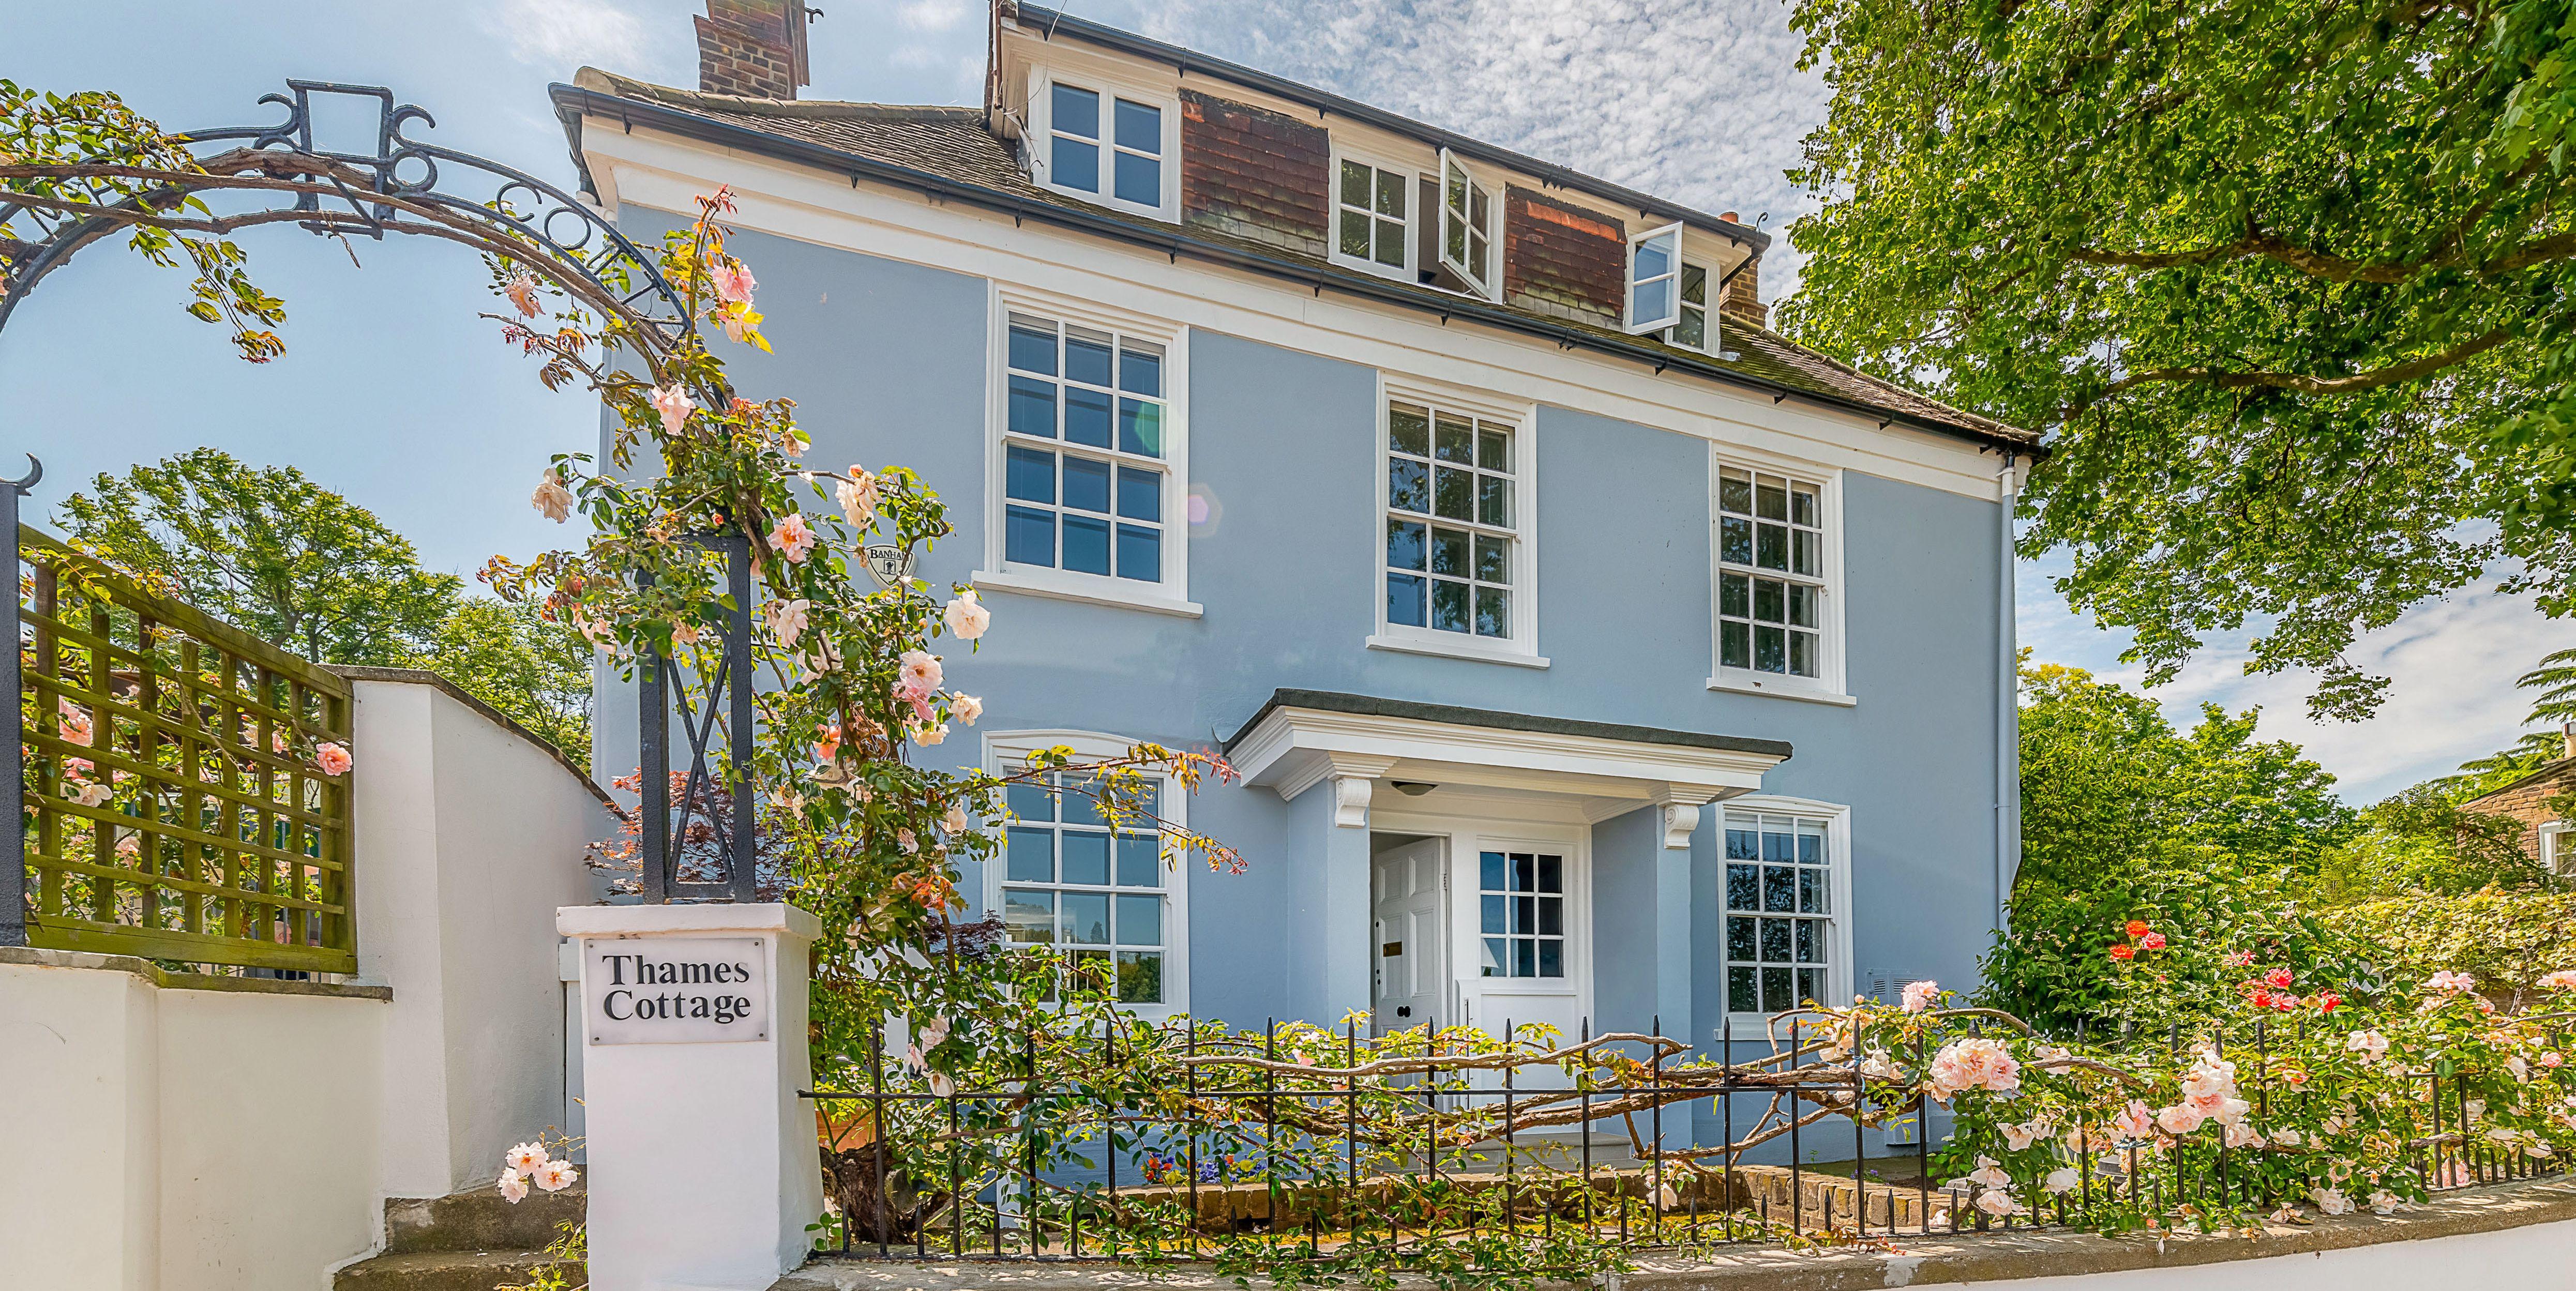 Thames Cottage - London - property - Knight Frank